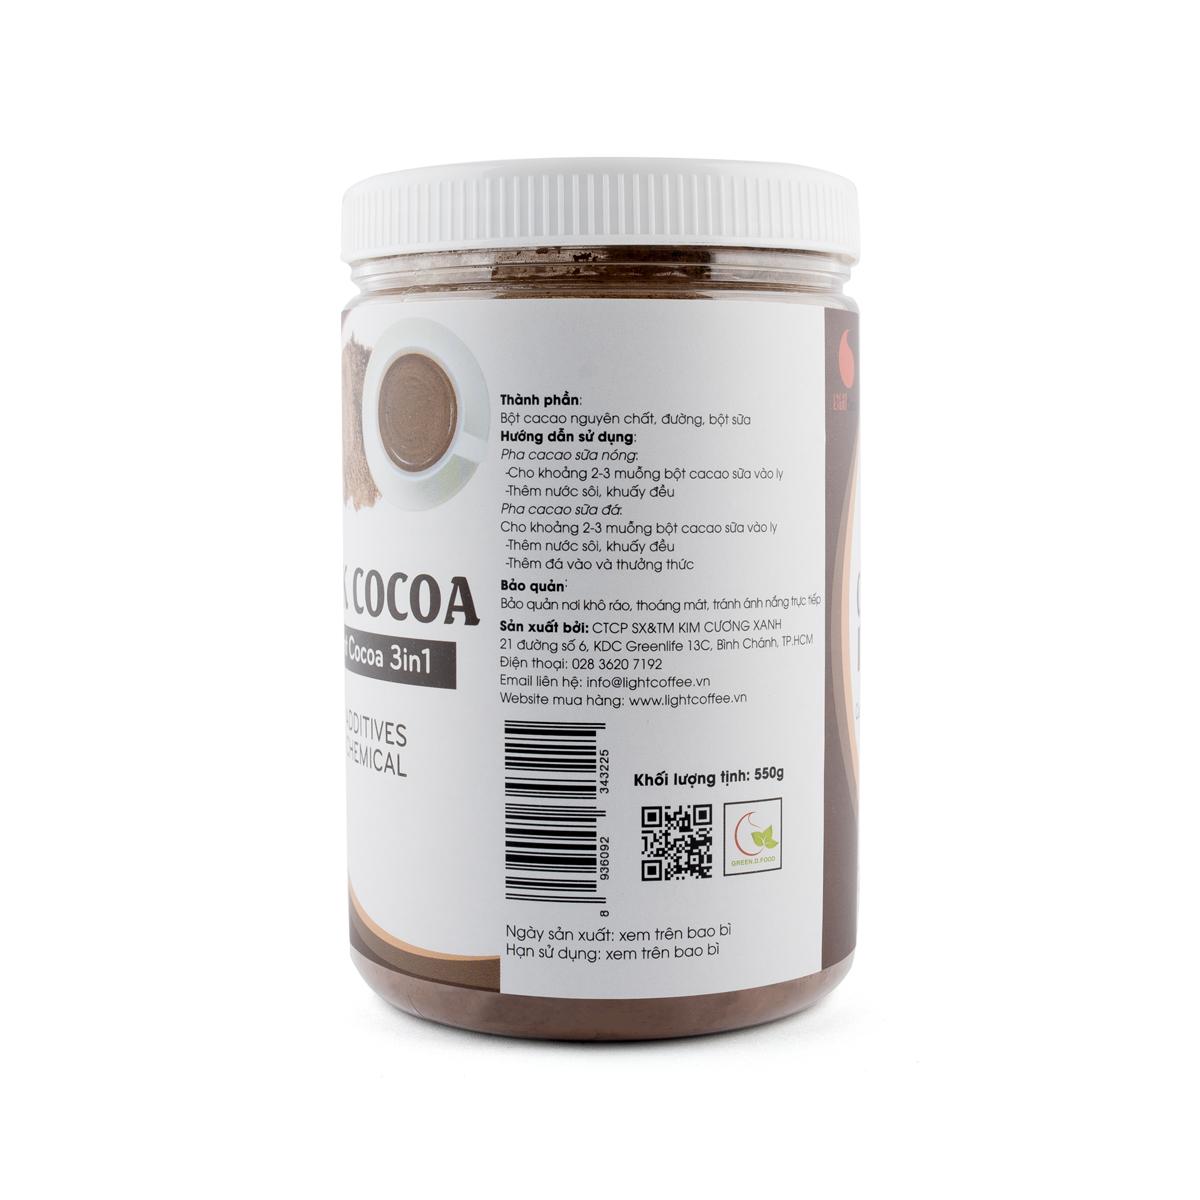 Cacao sữa 3in1 thơm ngon, tiện lợi Light Cacao - hũ 550g